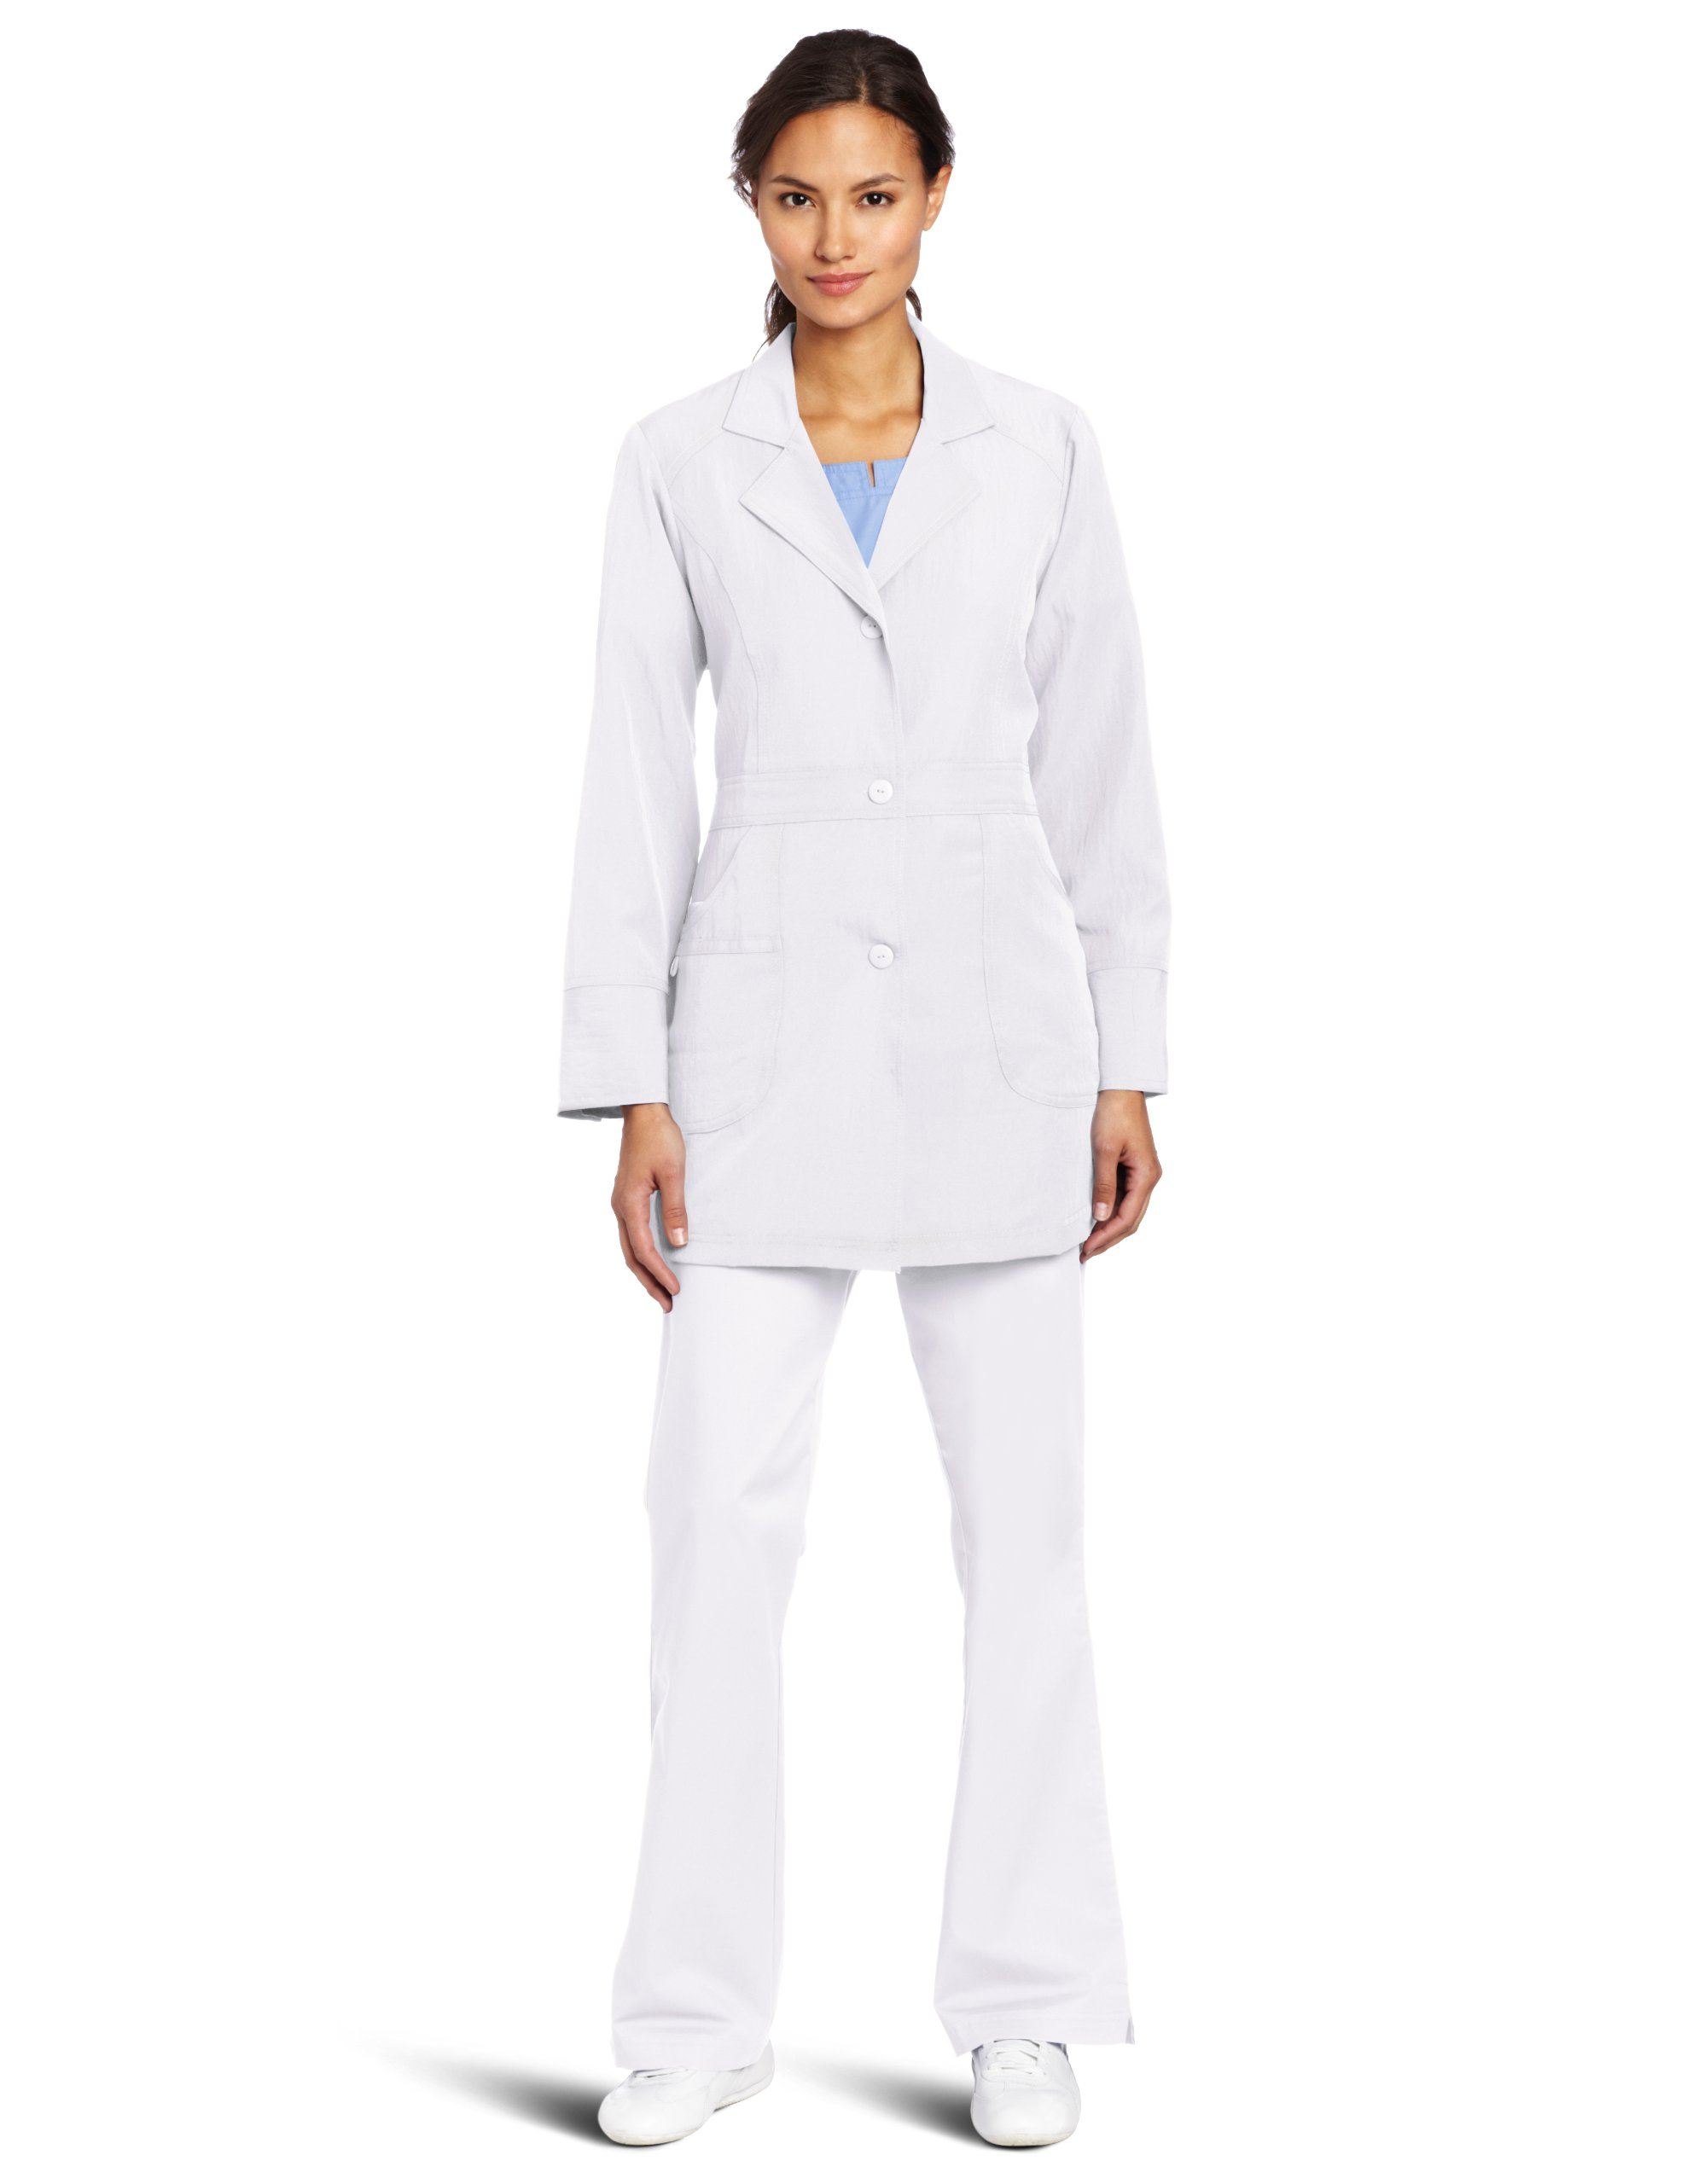 WonderWink Women's Scrubs Utility Girl Stretch Lab Coat, White, Medium